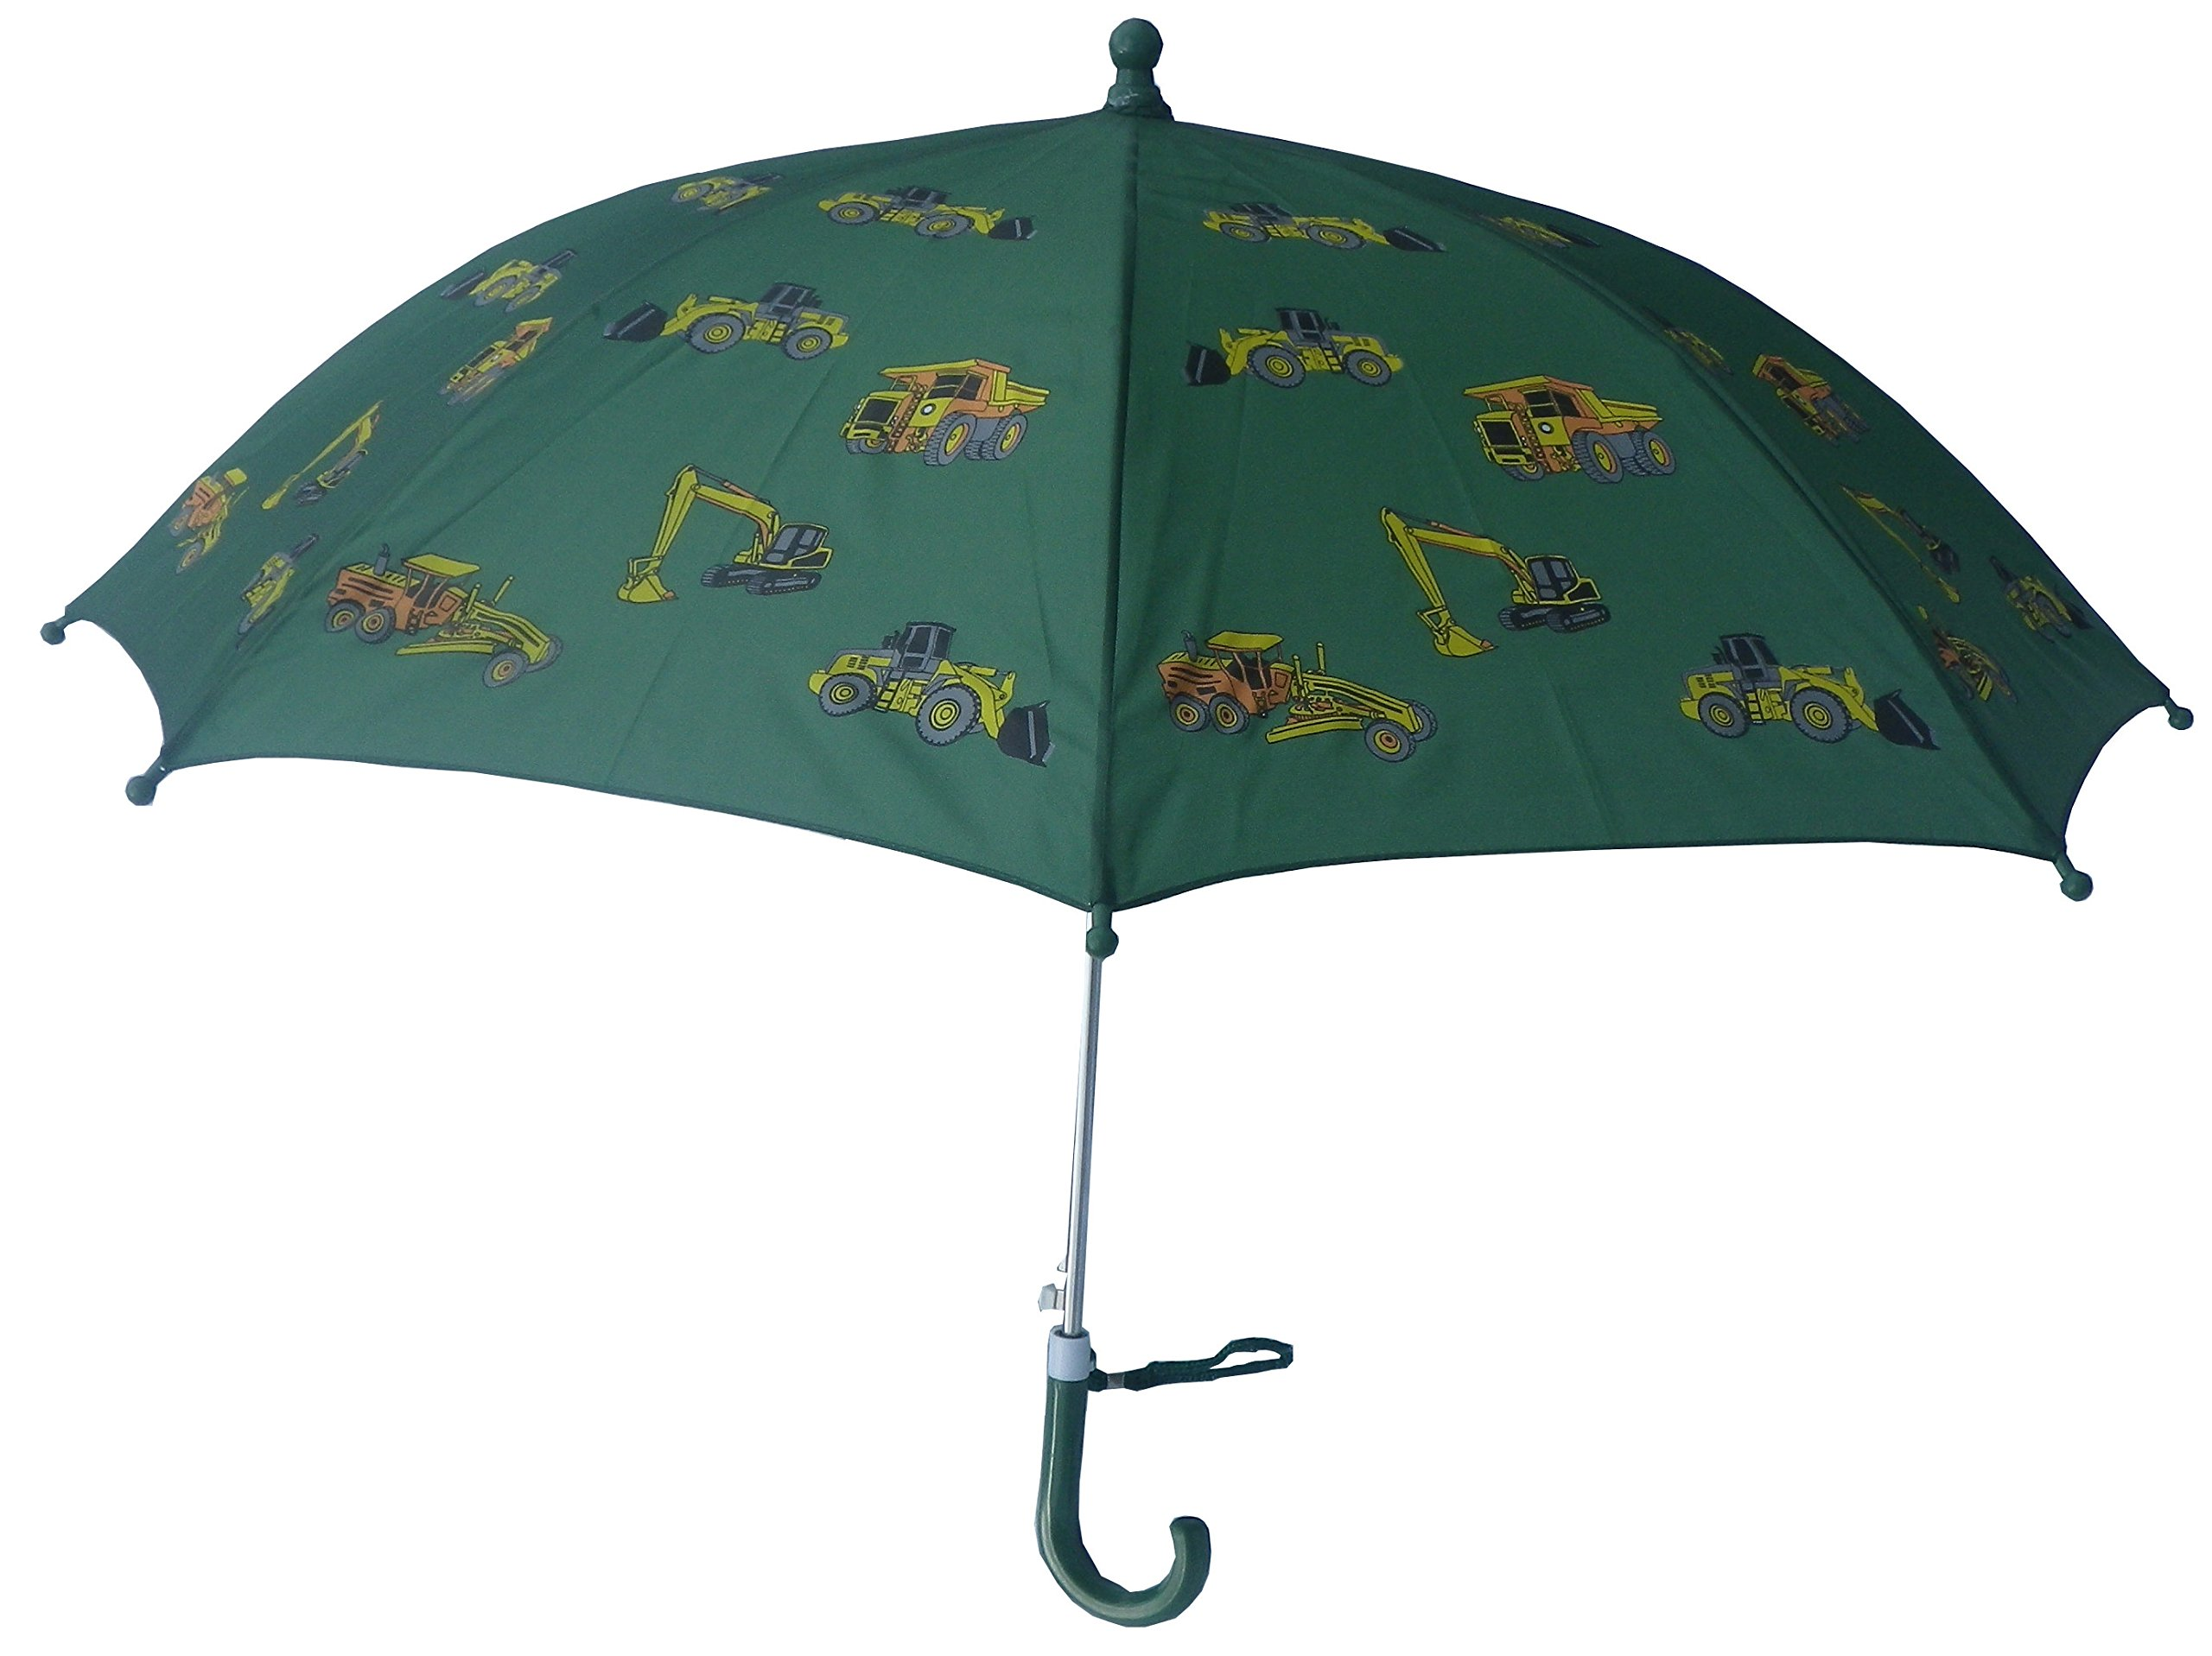 Foxfire for Kids Solid Pattern Umbrella Green Construction Equipment